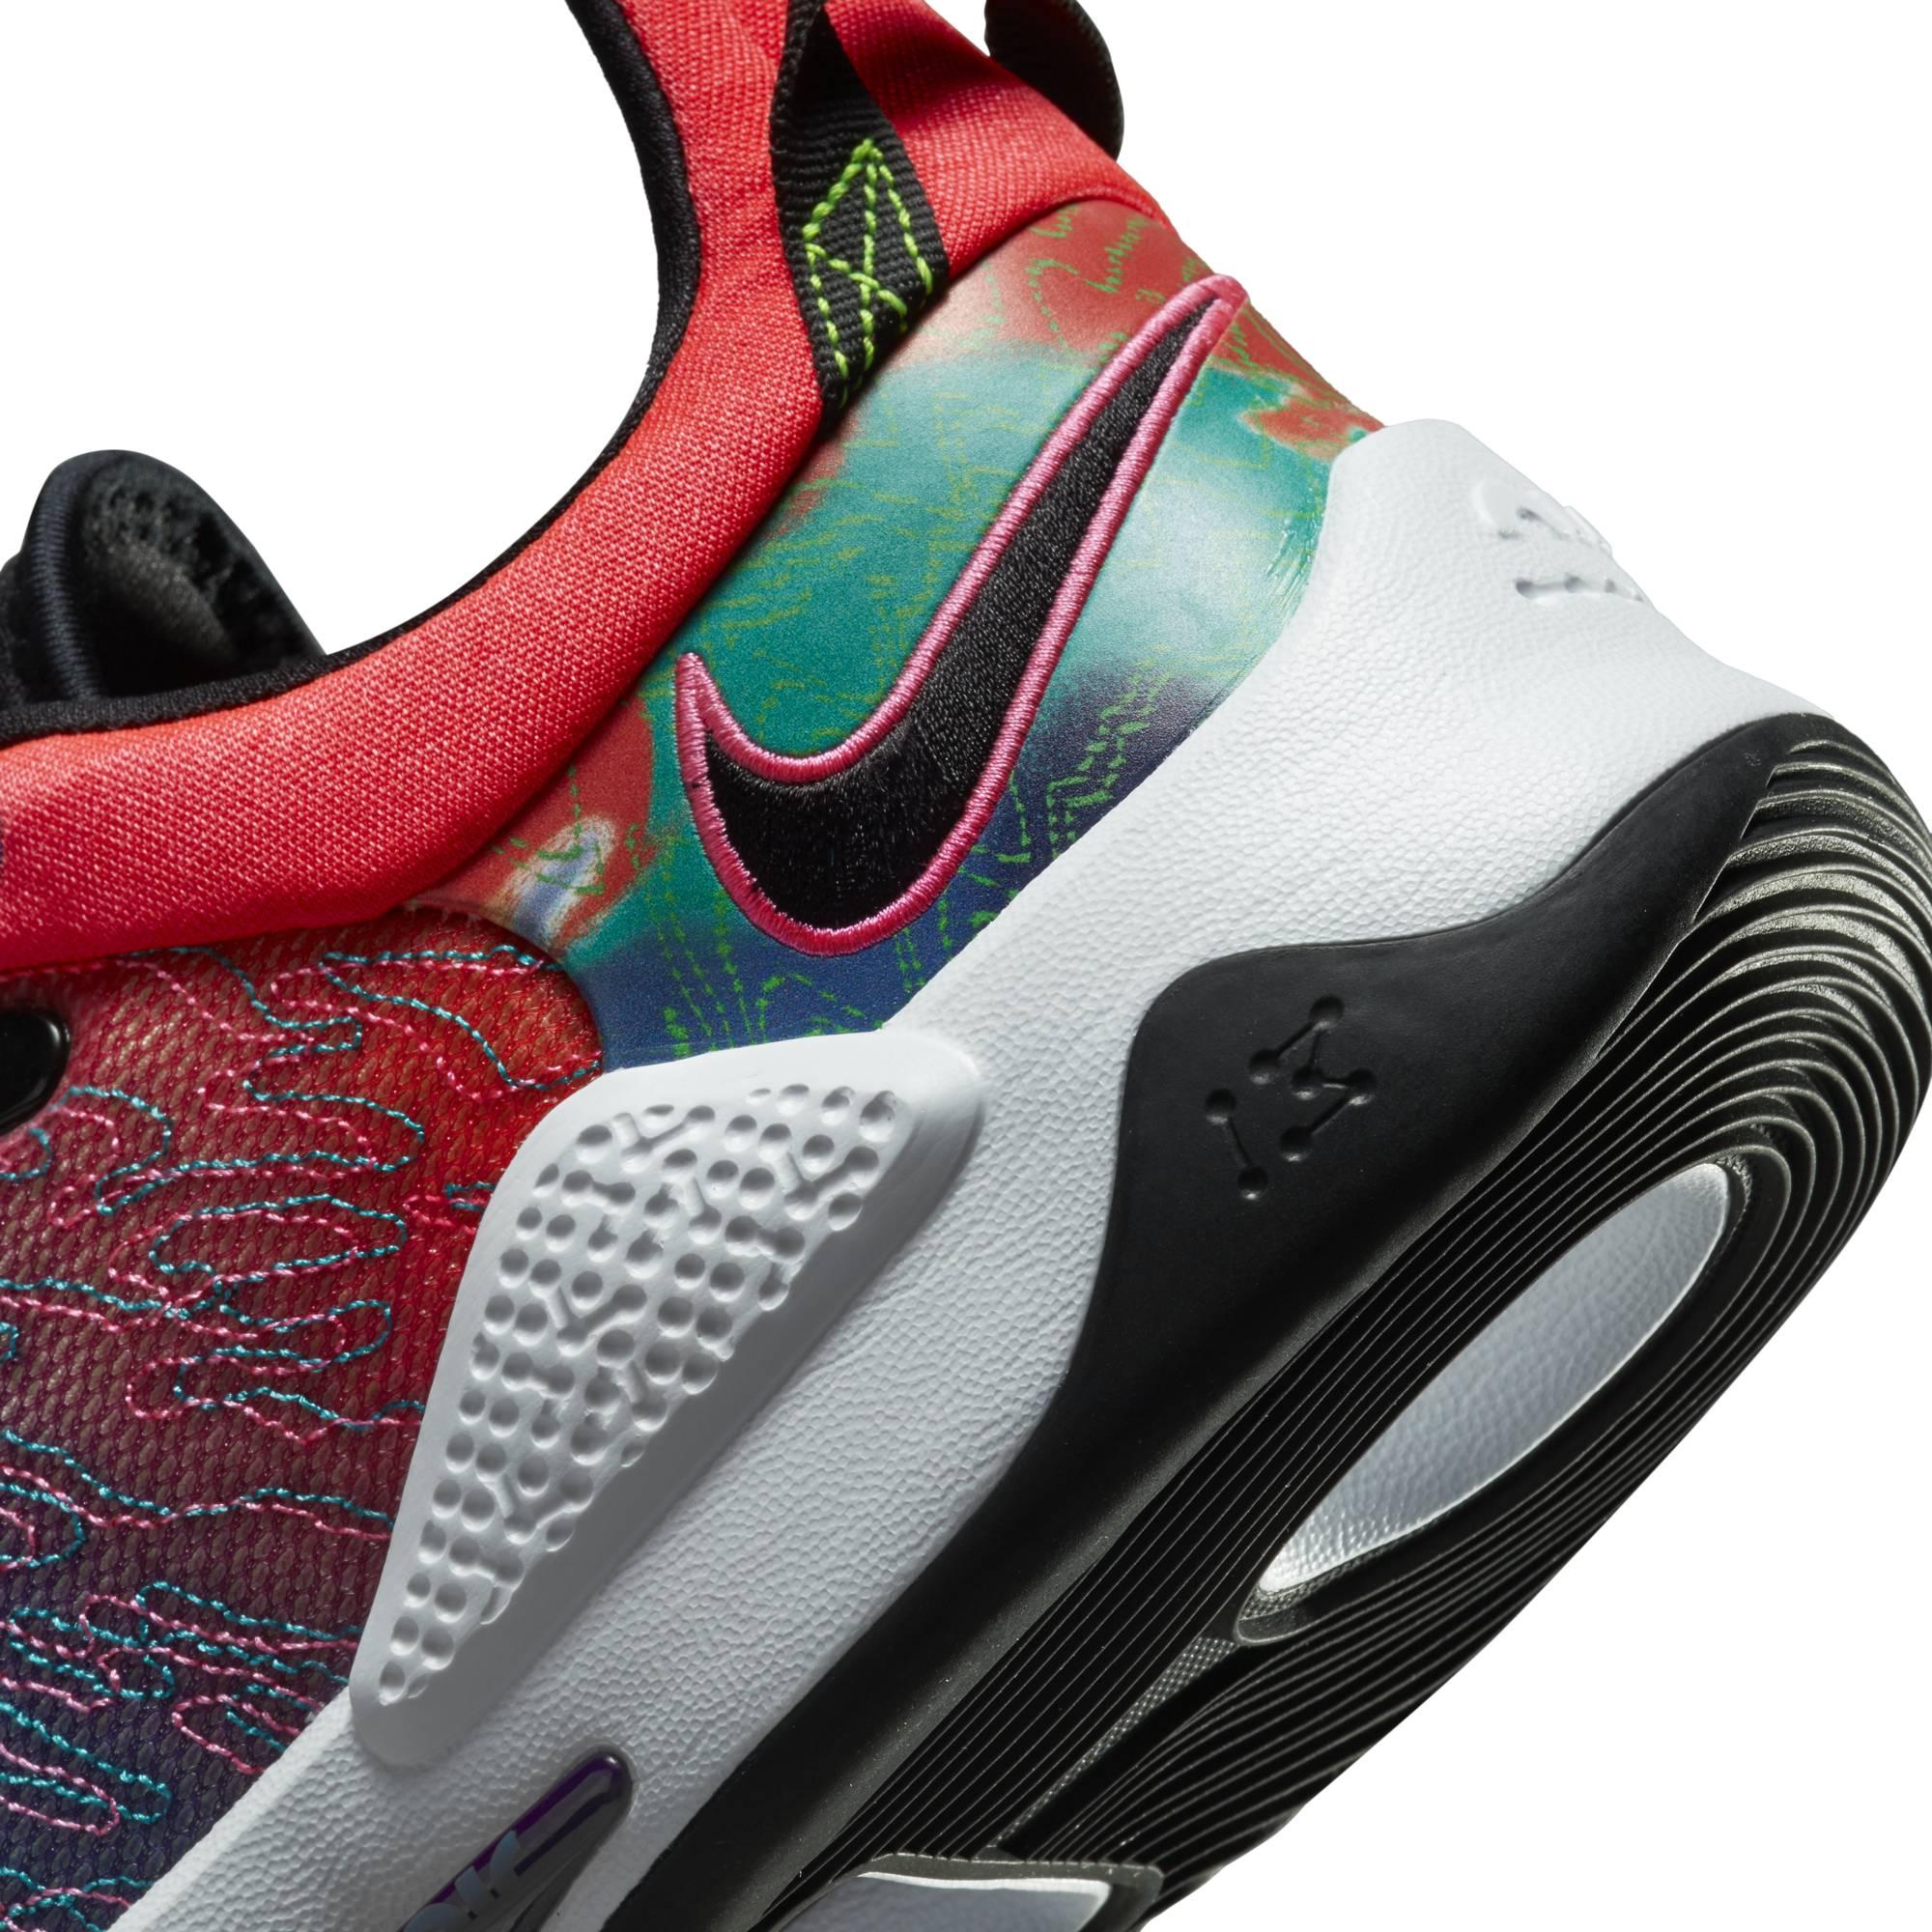 Nike Men's PG5 Bright Crimson- now available